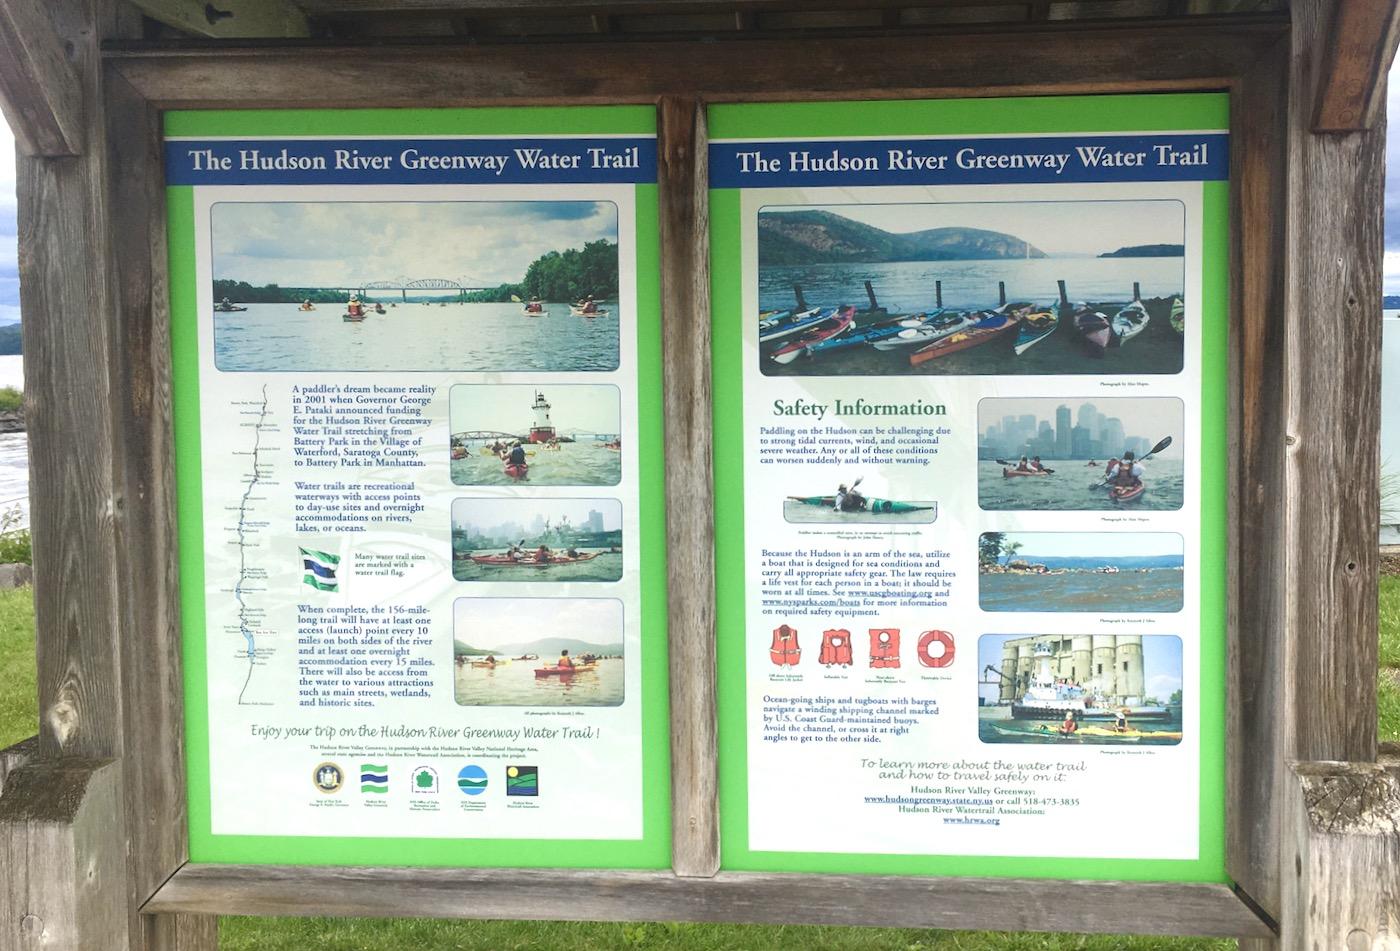 Hudson River Greenway Water Trail map